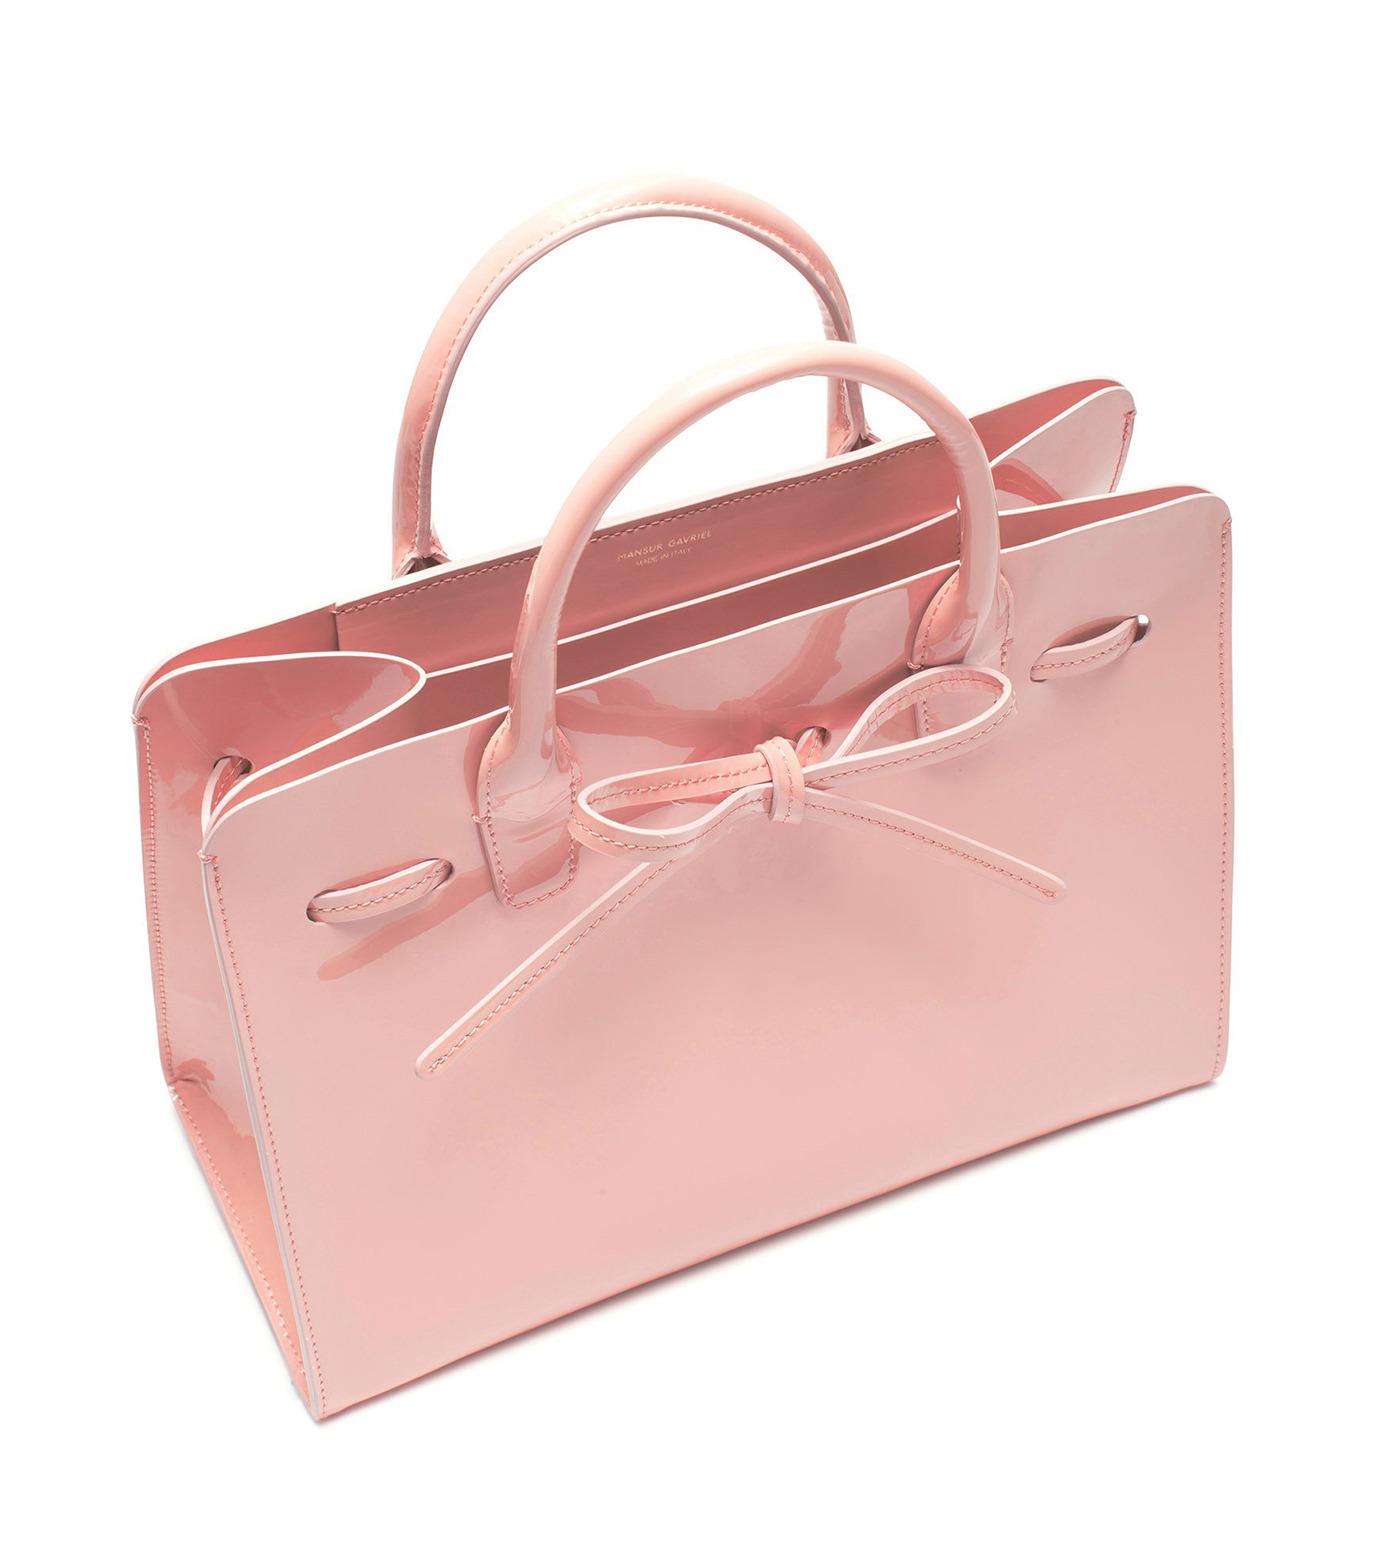 Mansur Gavriel(マンサーガブリエル)のpatent mini sun bag-LIGHT PINK(ハンドバッグ/hand bag)-HMS030PA-71 拡大詳細画像2